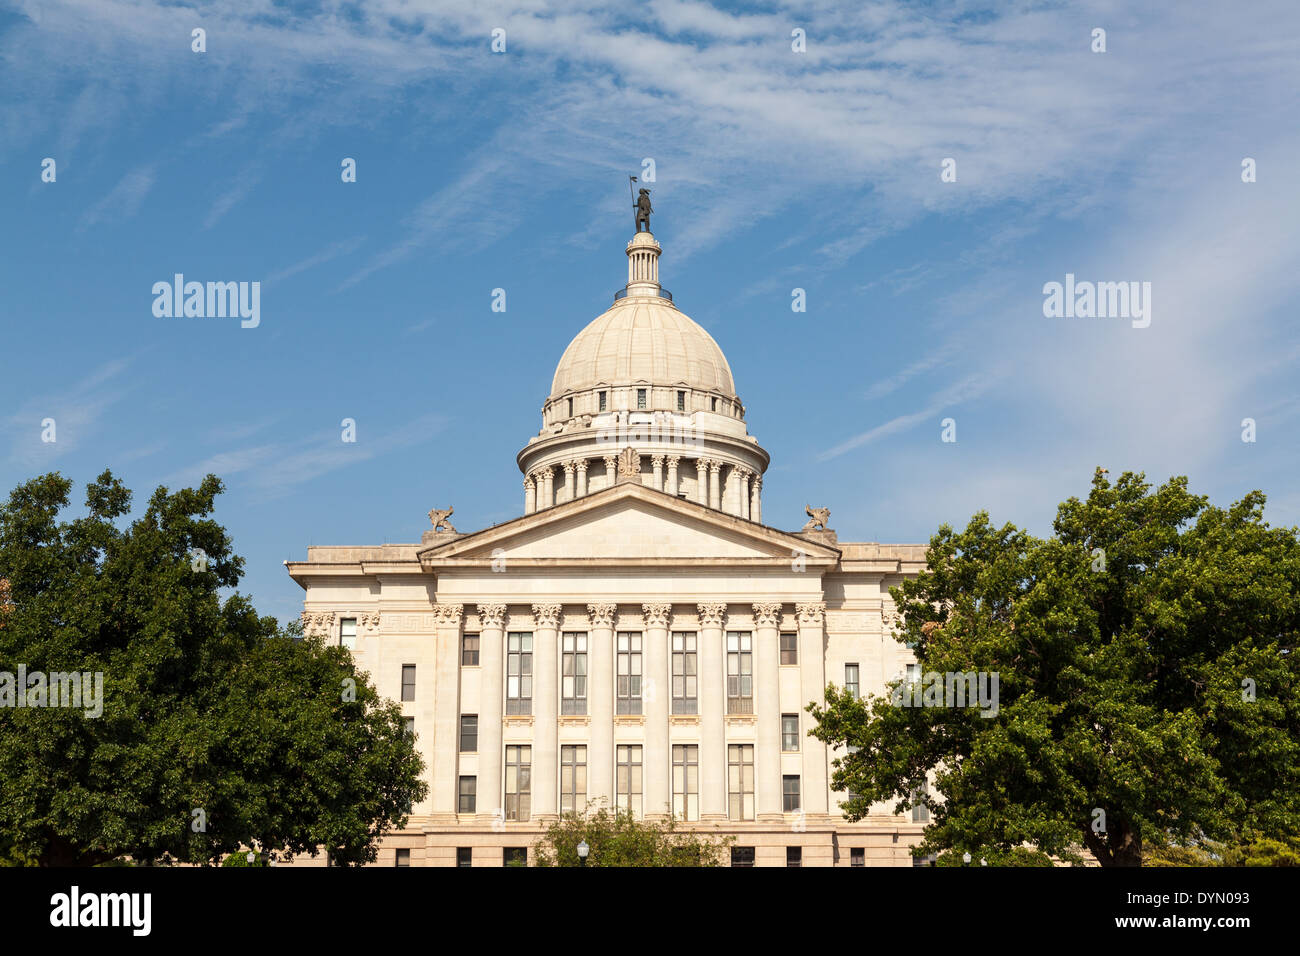 Oklahoma State Capitol Building, Oklahoma City - Stock Image